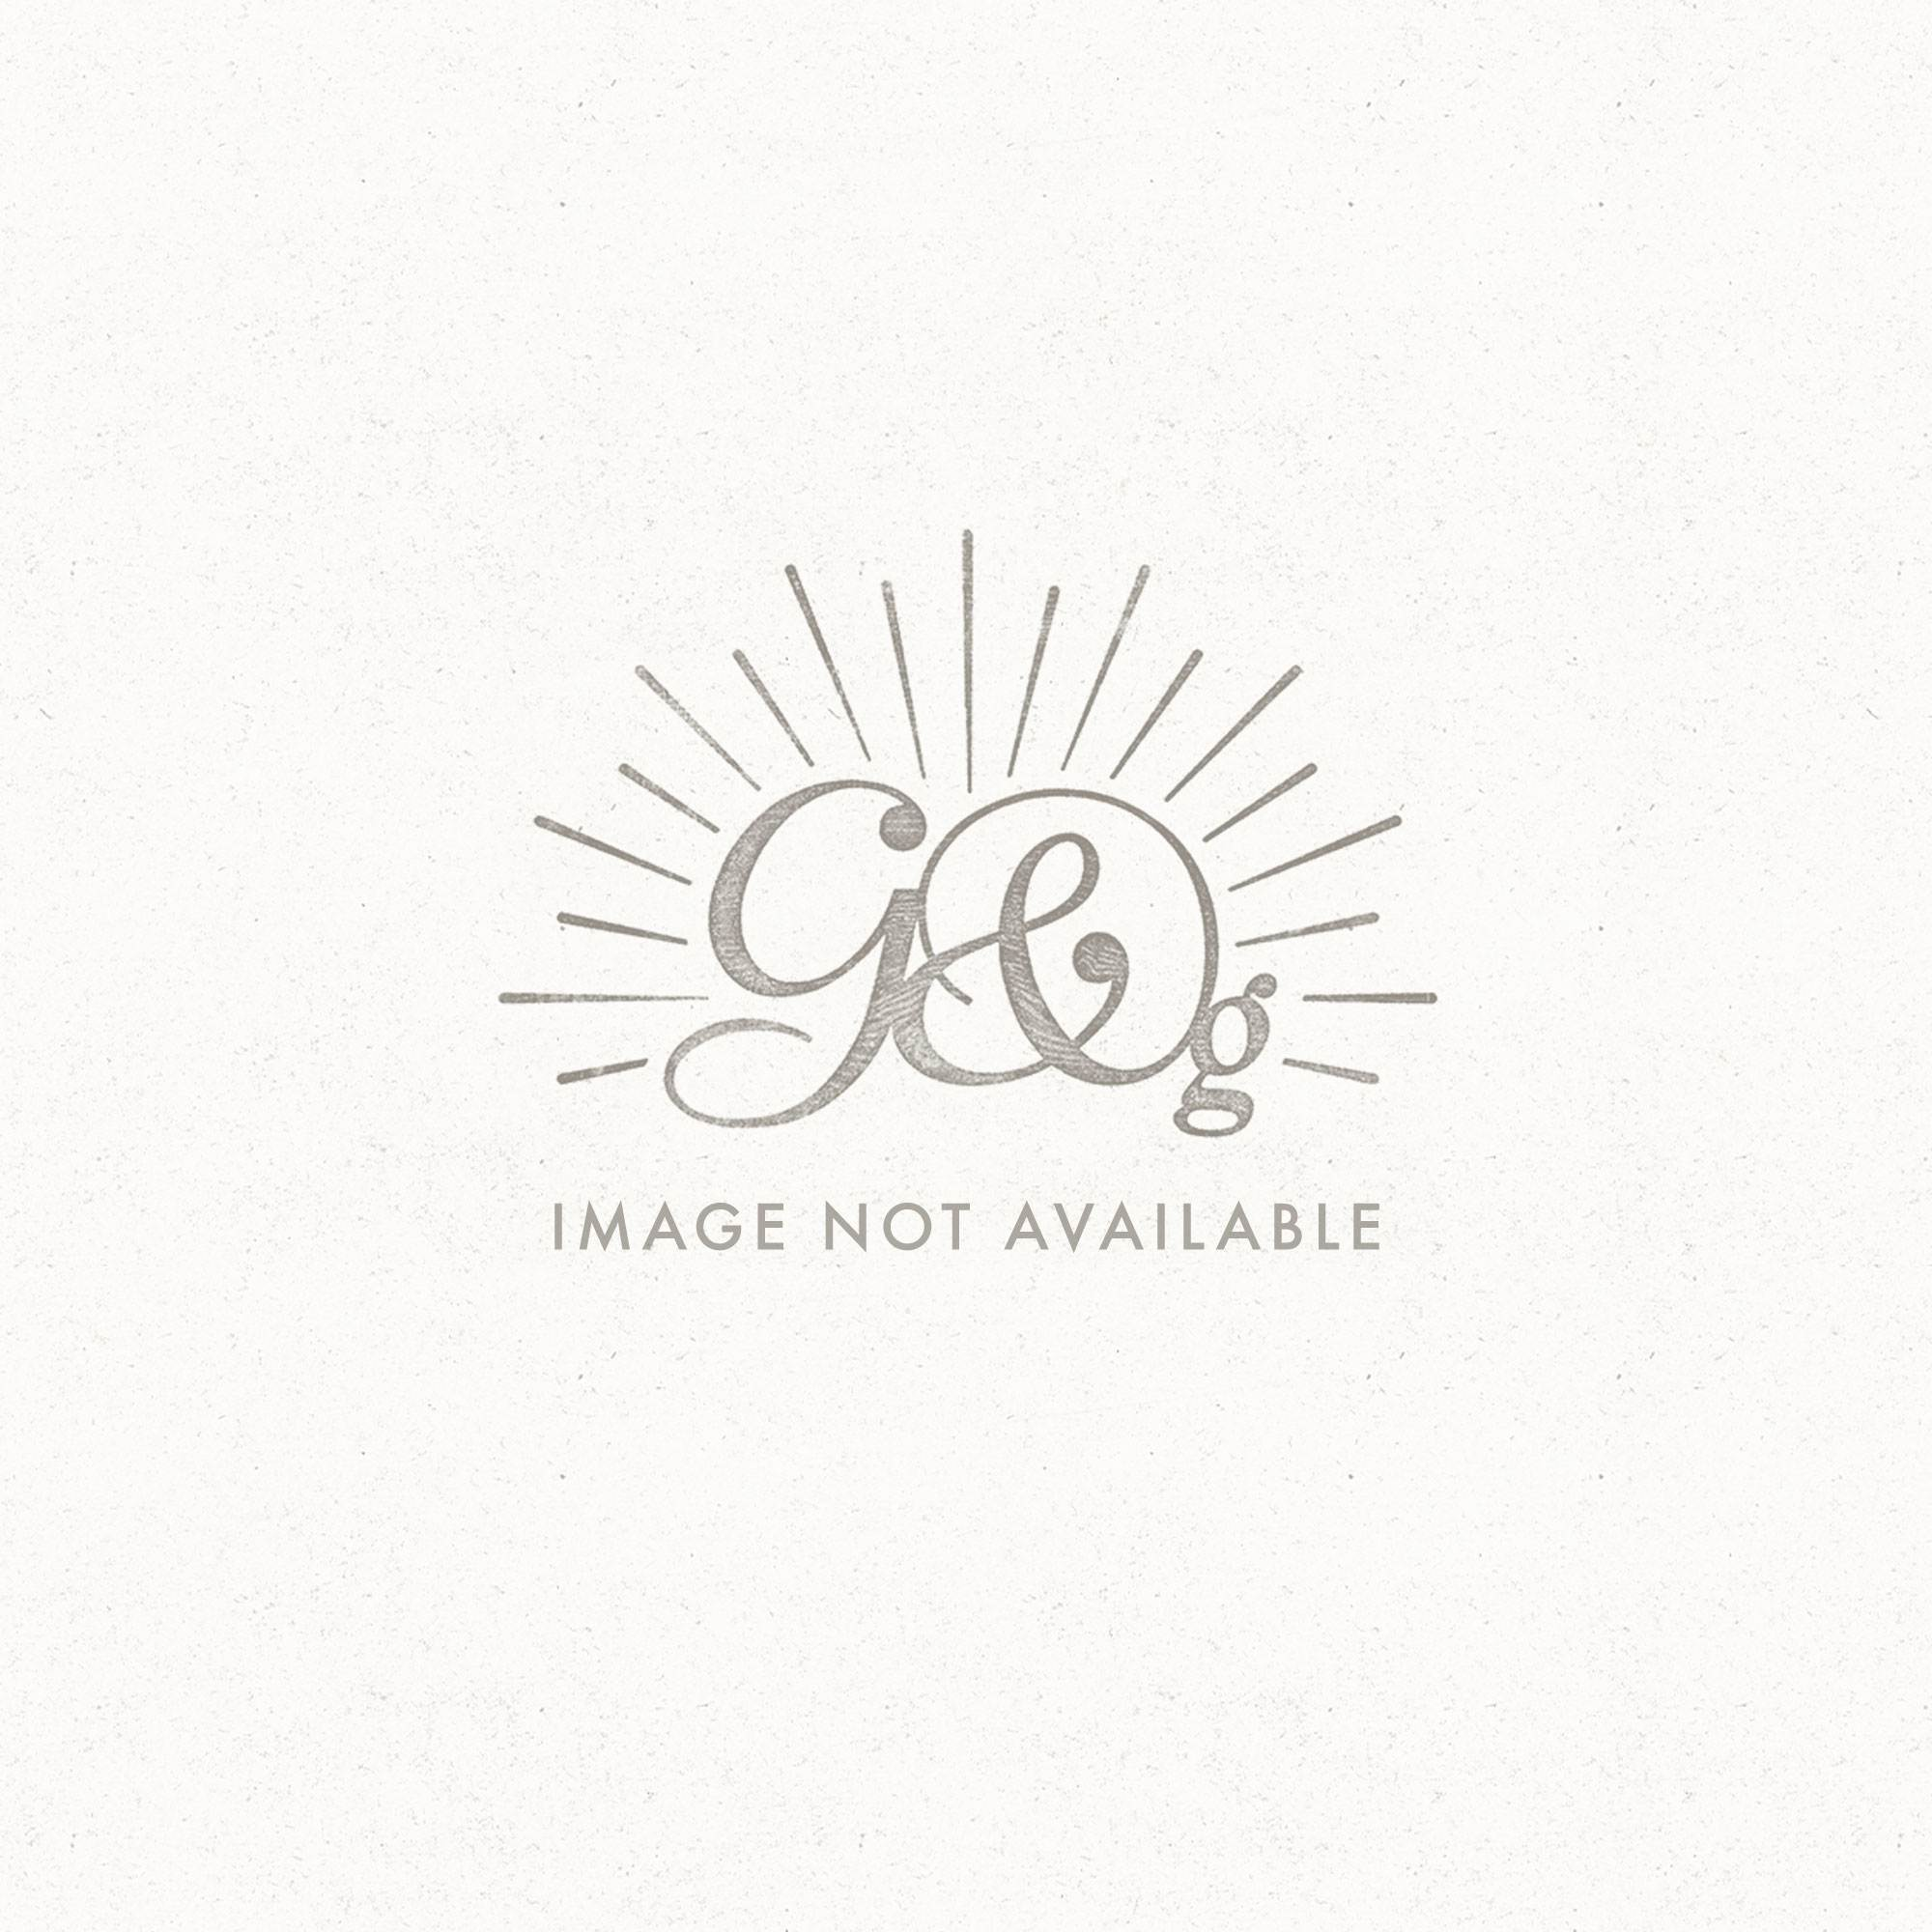 Gold Fir Cone Branch - Thumbnail